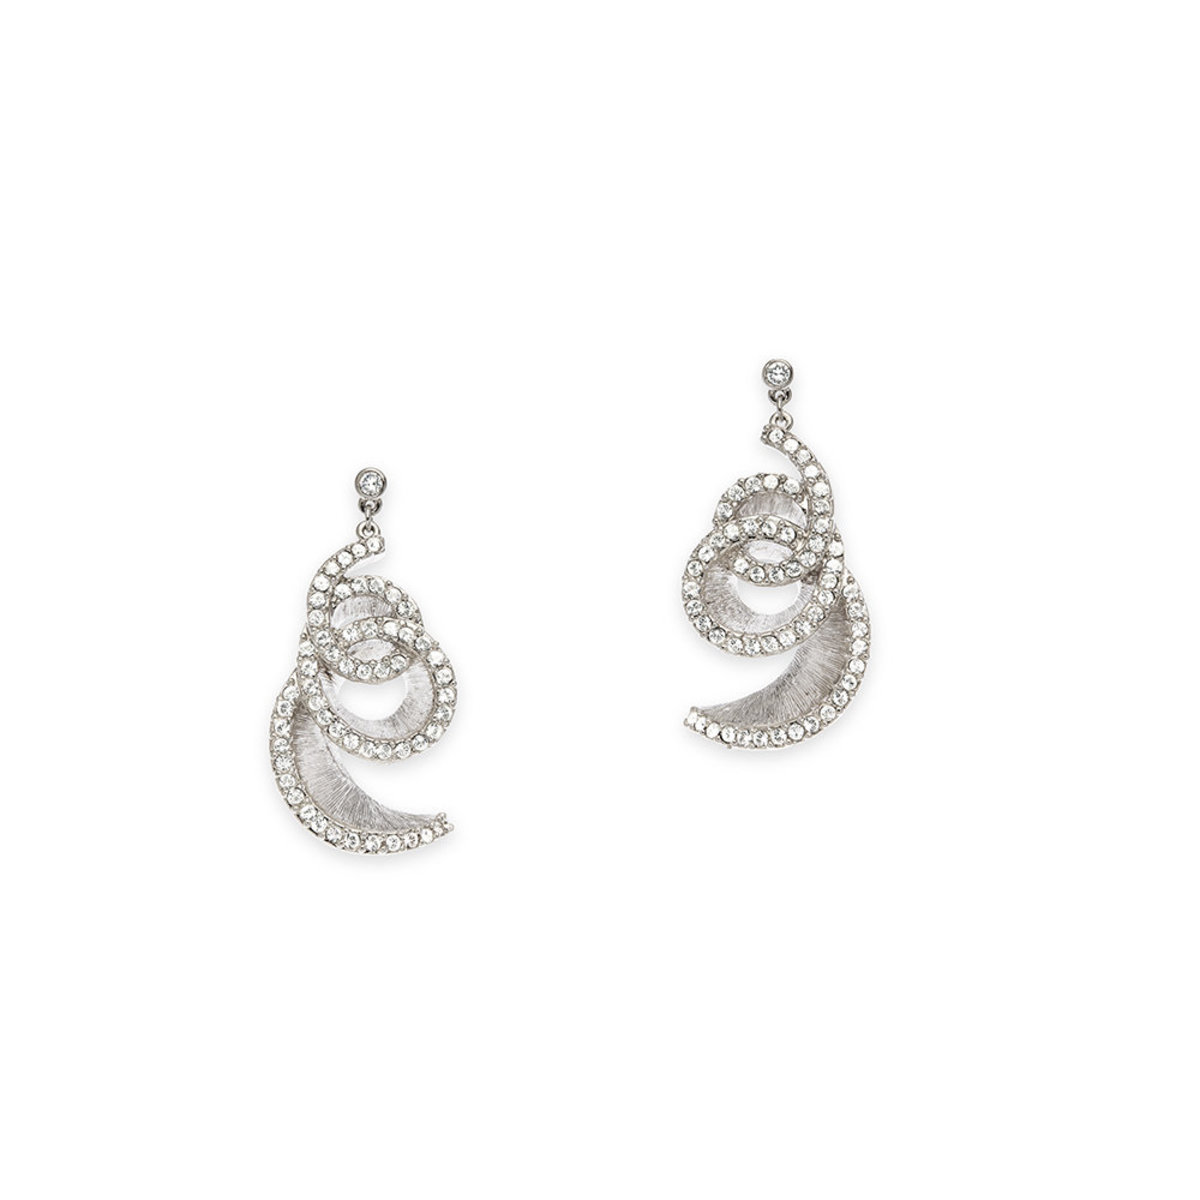 The Wave: platnium plating, Swarovski crystal pierced earrings